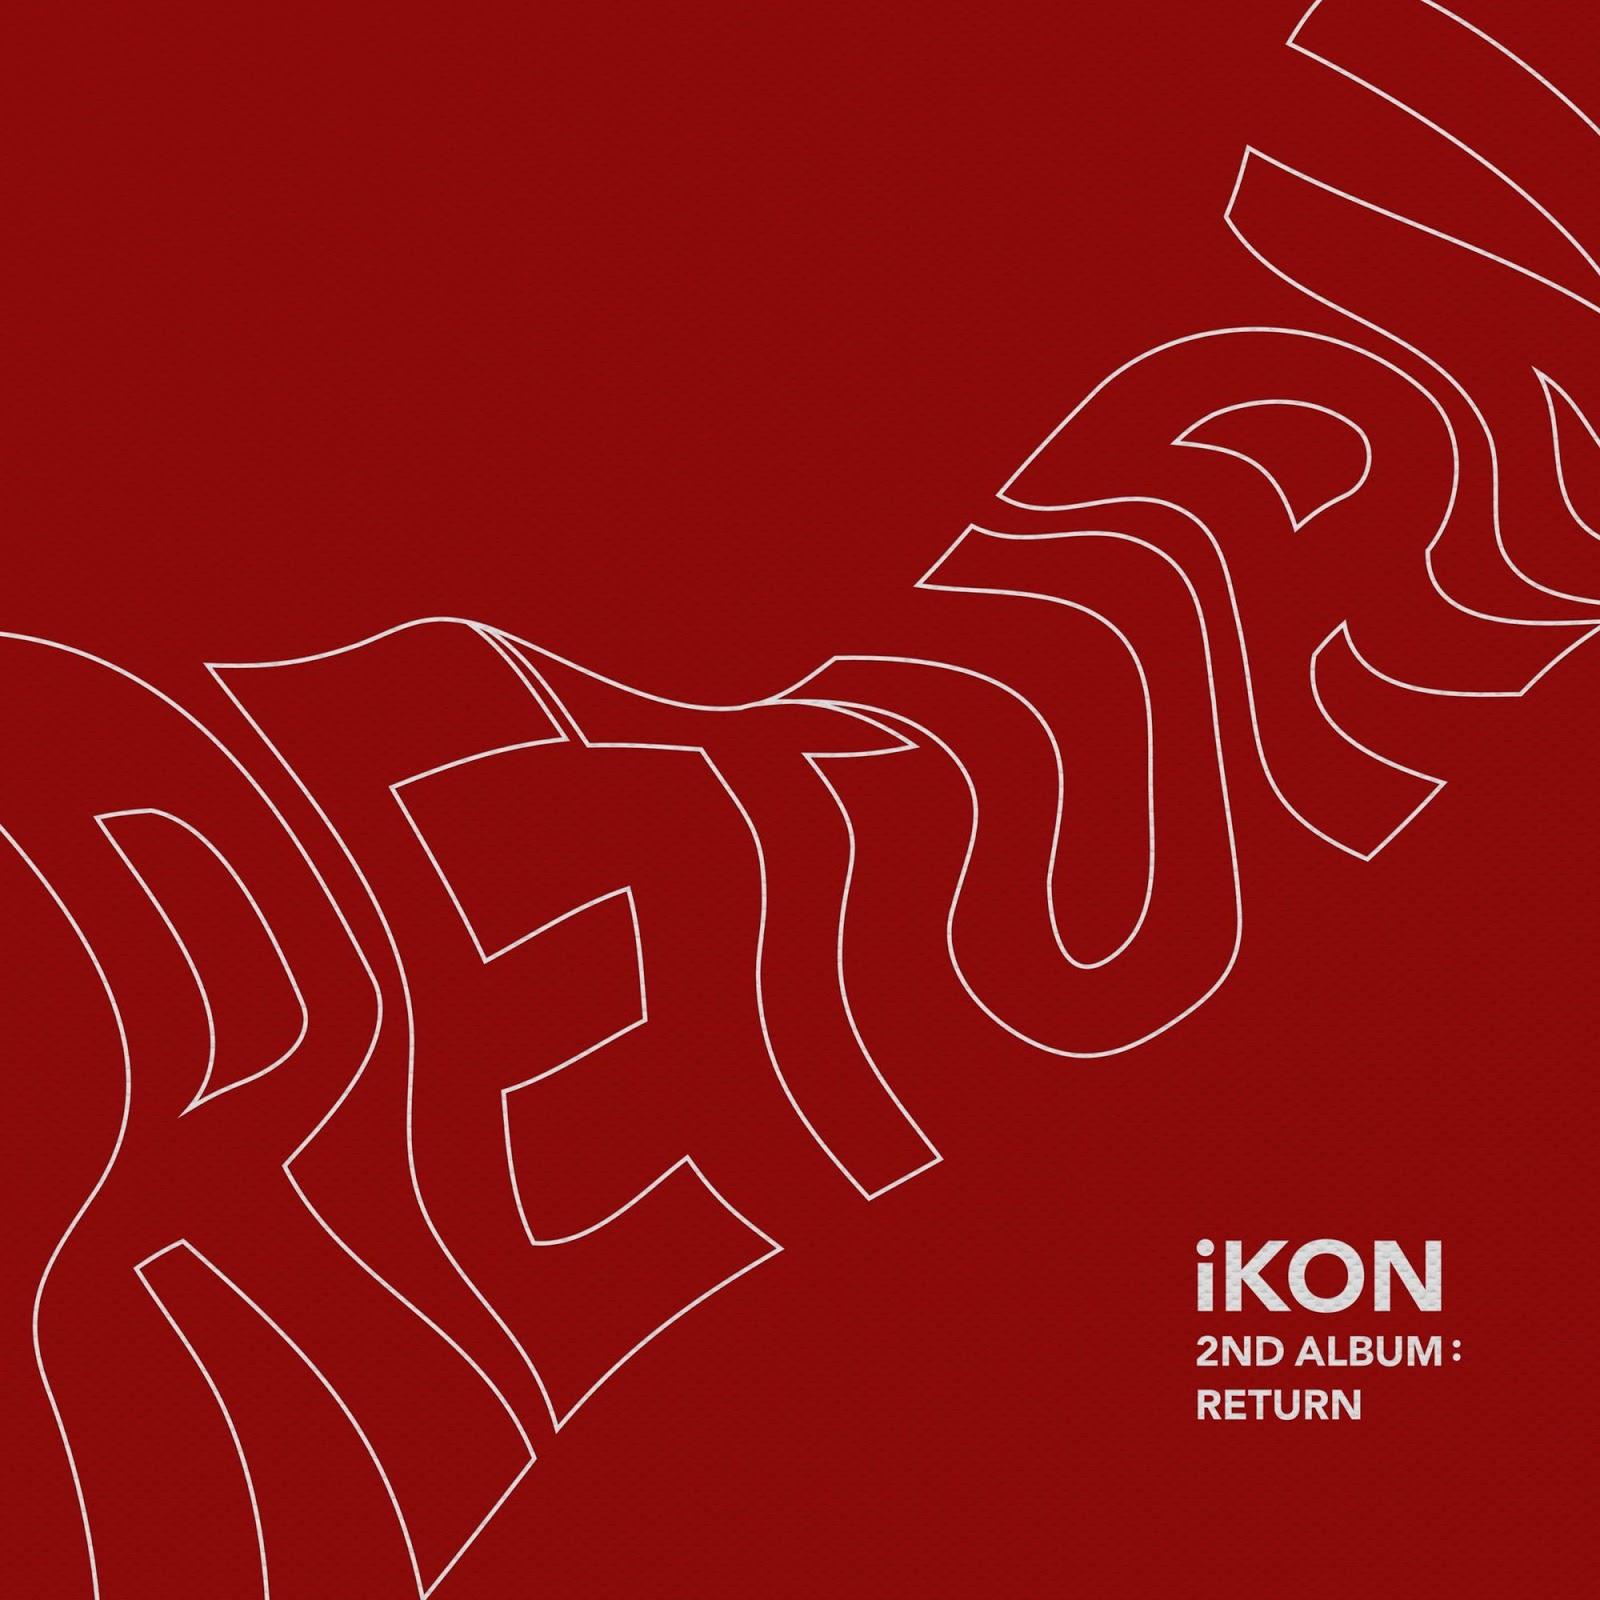 Korean MyuzicStyleZ: iKON (B I Solo) - ONE AND ONLY [Easy